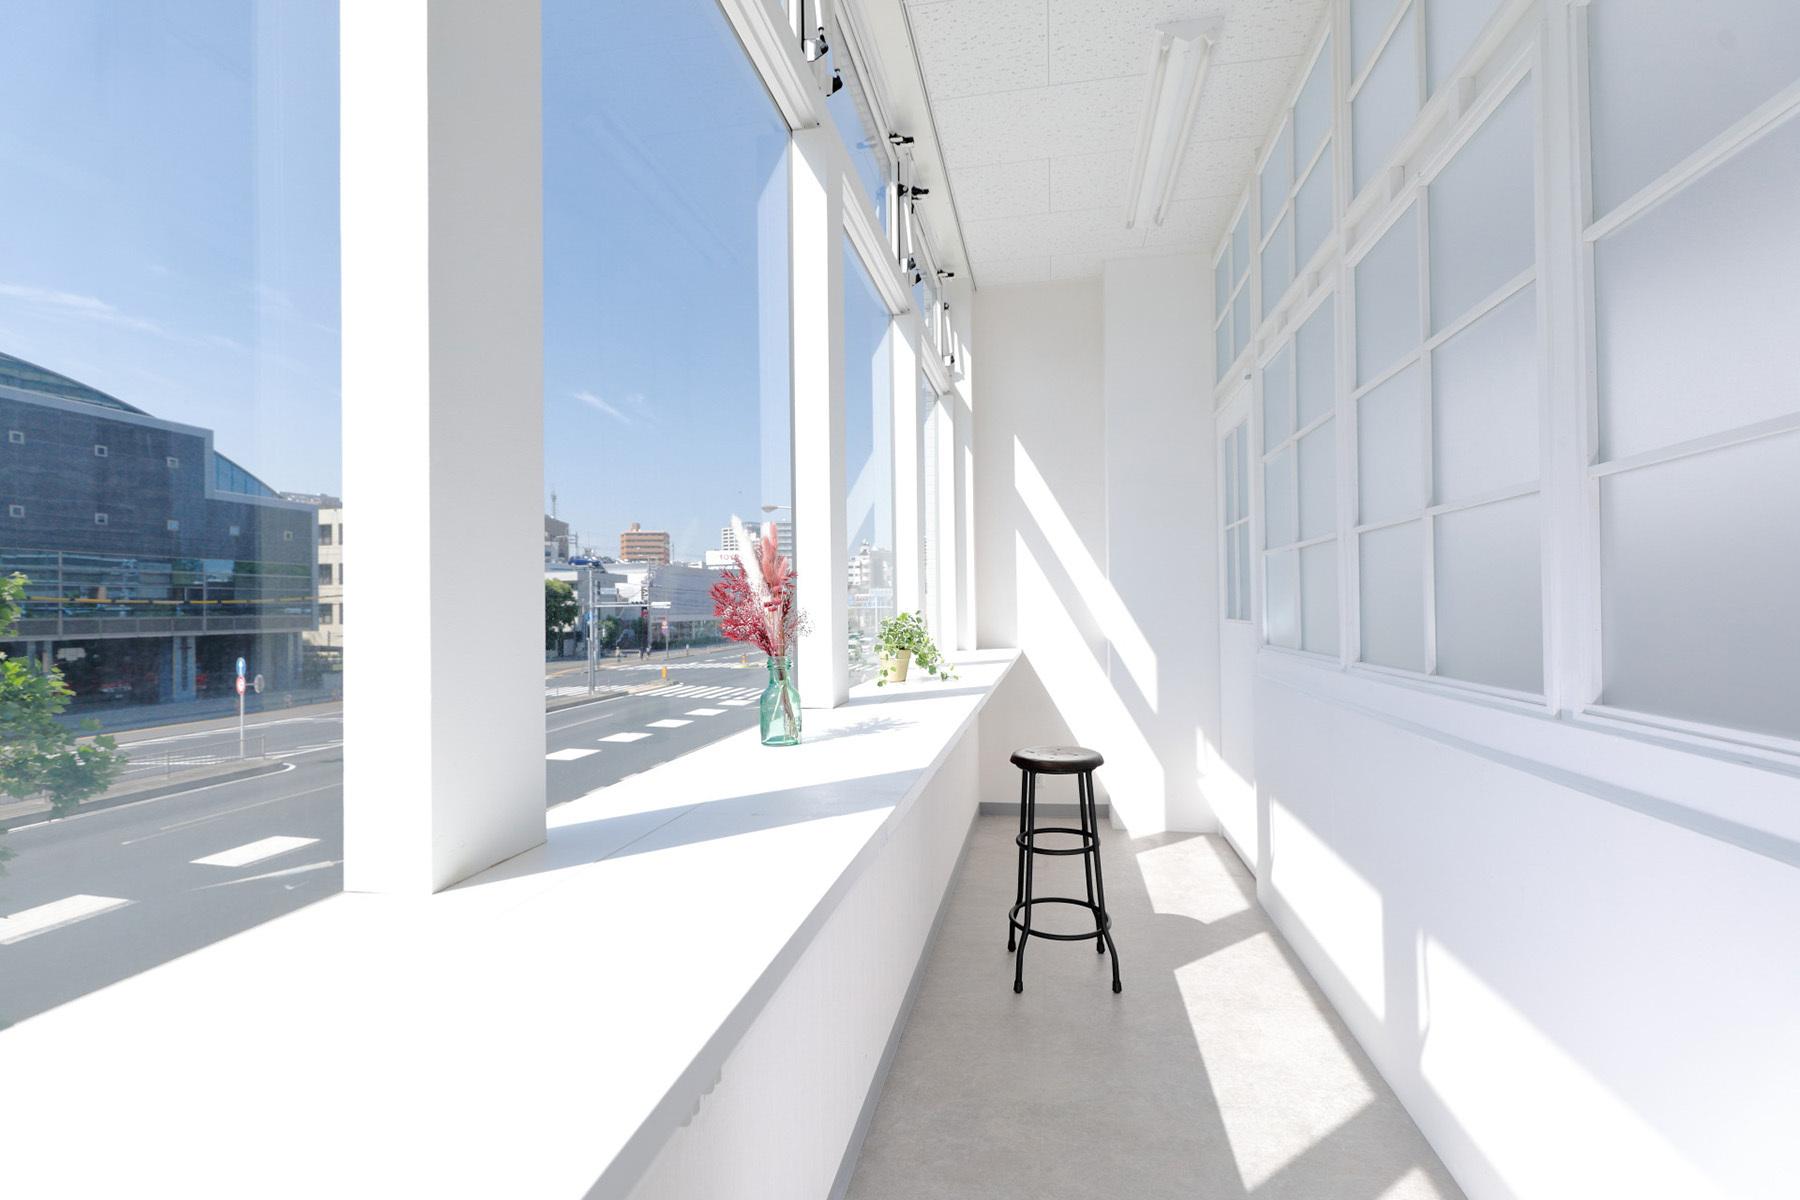 STUDIO TWOBEE  (スタジオ トゥービー)2種類のヴィンテージ加工のドア